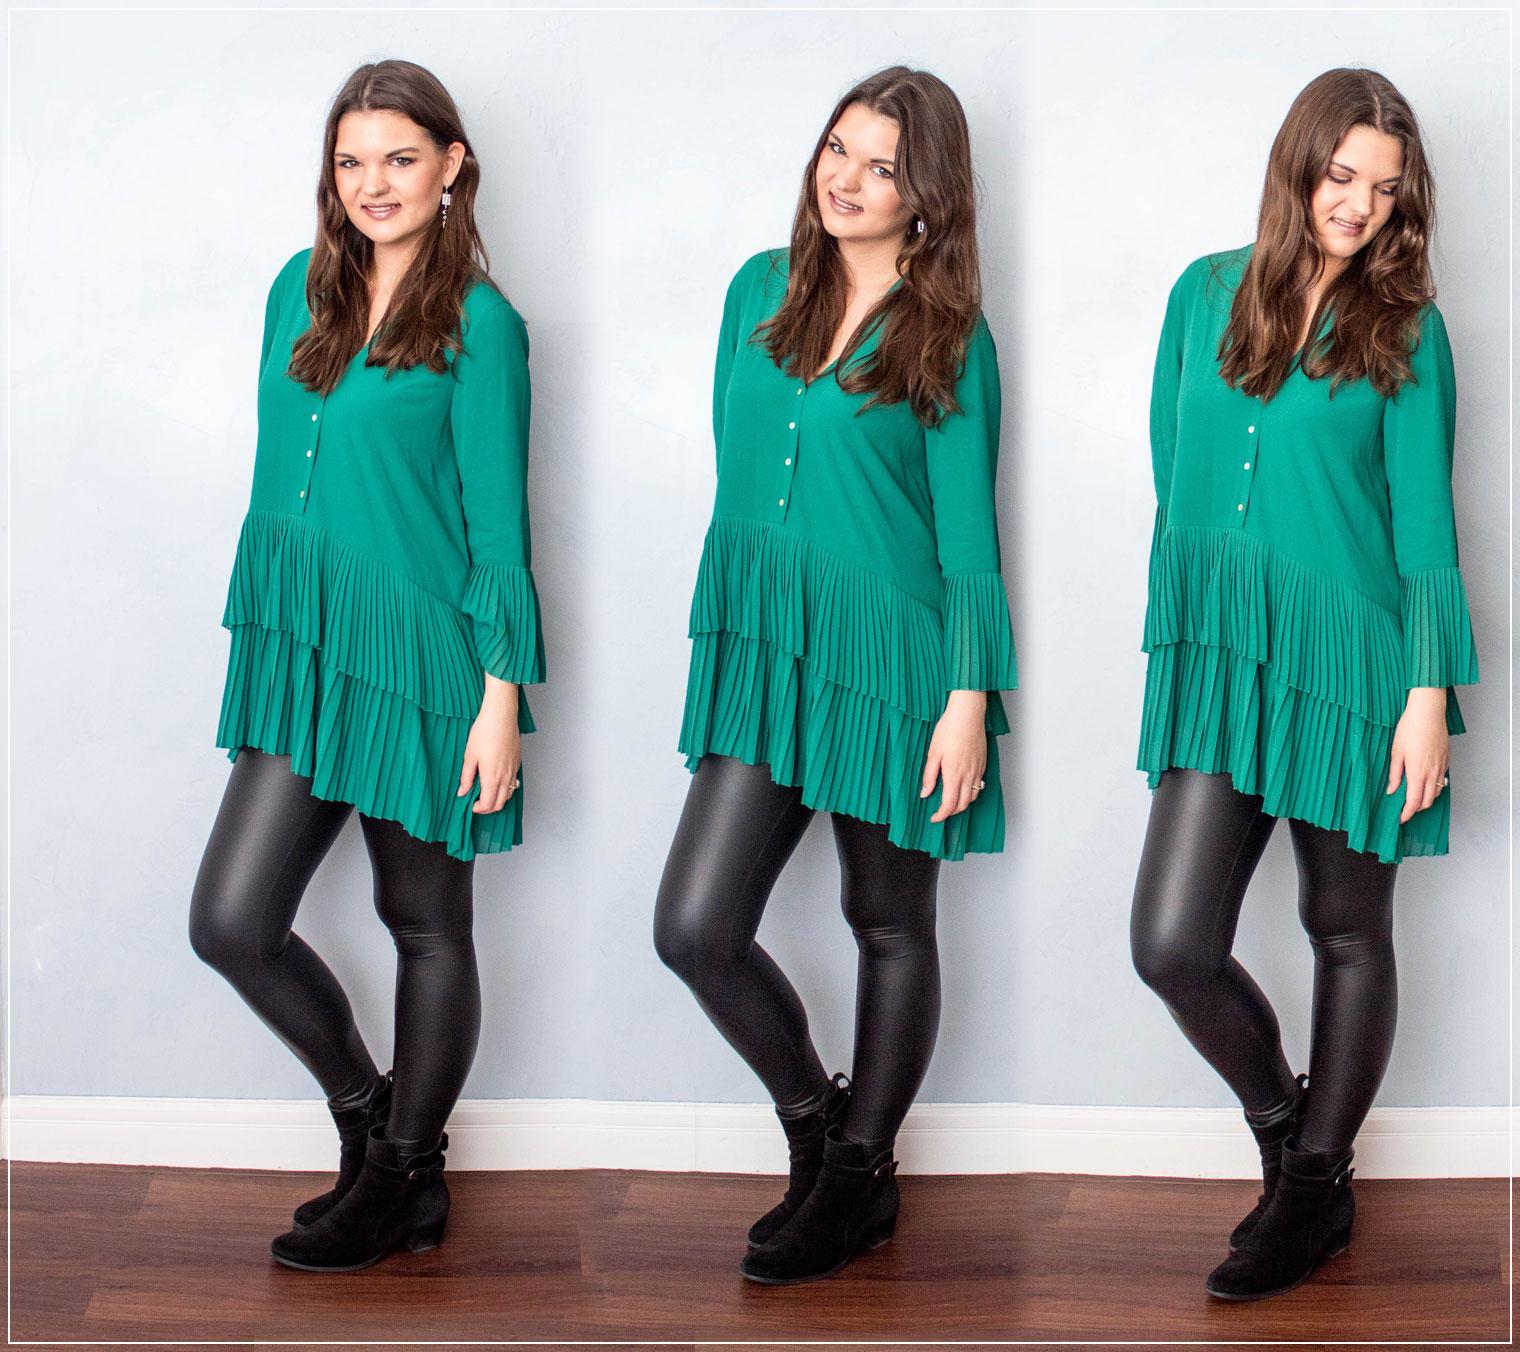 Dailylook, Winterstyle, Herbststyle, Fashionblog, Modebloggerin, Ruhrgebiet, Monatsreview, Modeblog